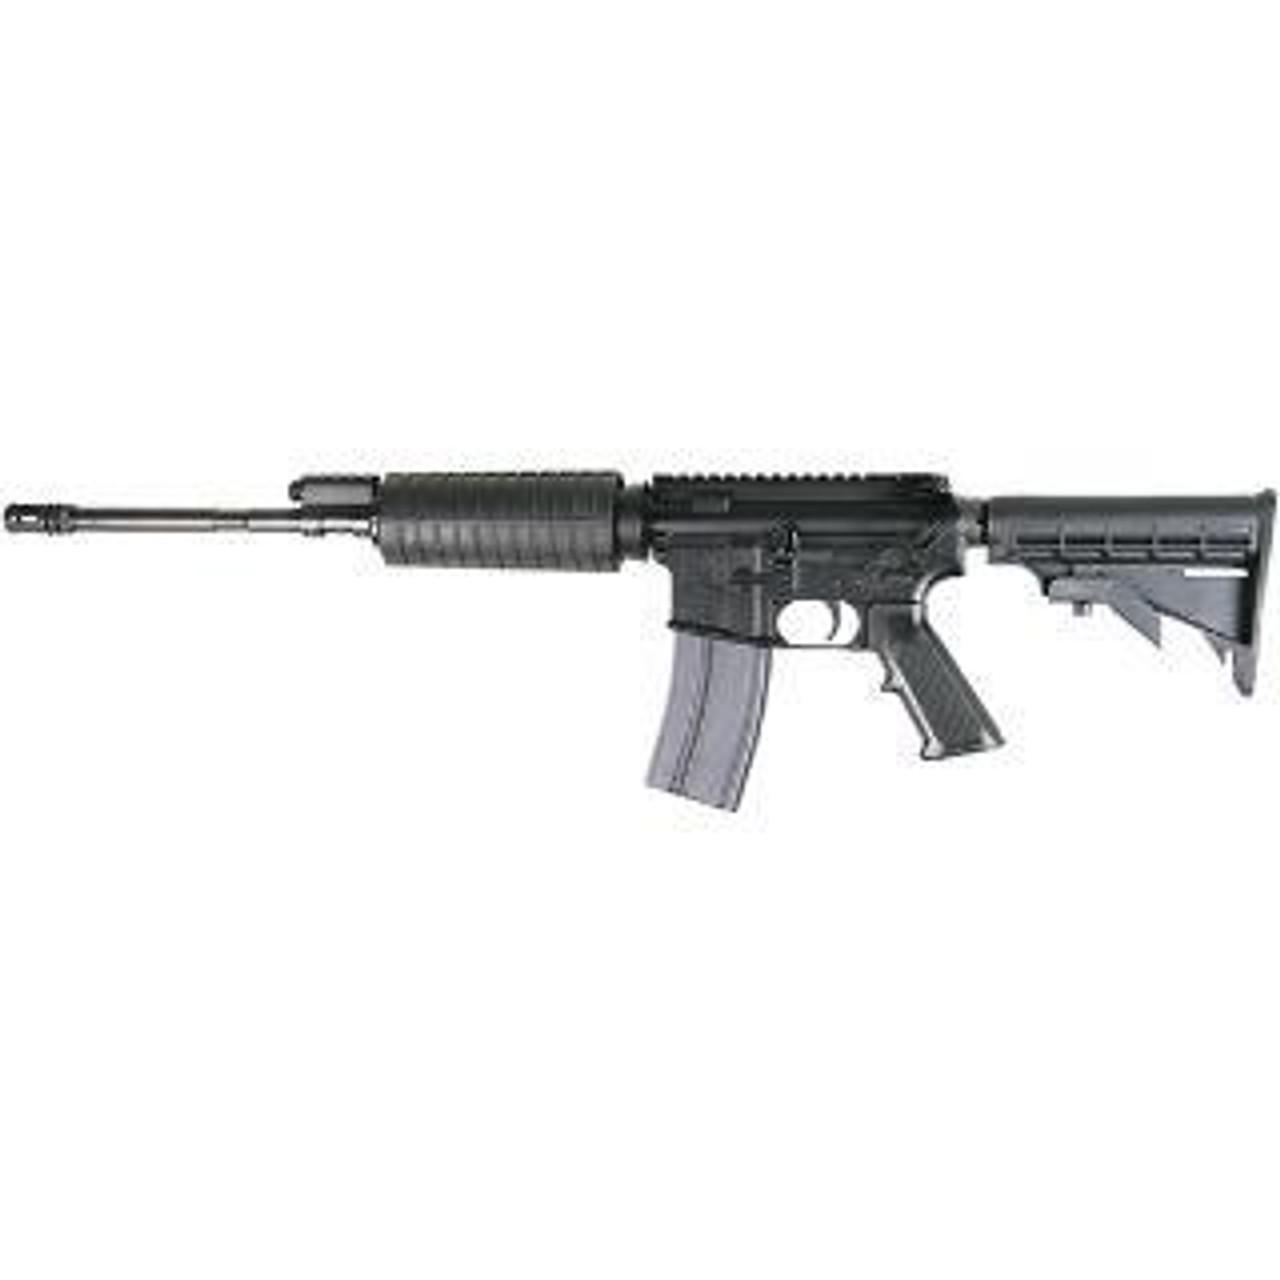 Adams Arms Base Carbine CALIFORNIA LEGAL - .223/5.56